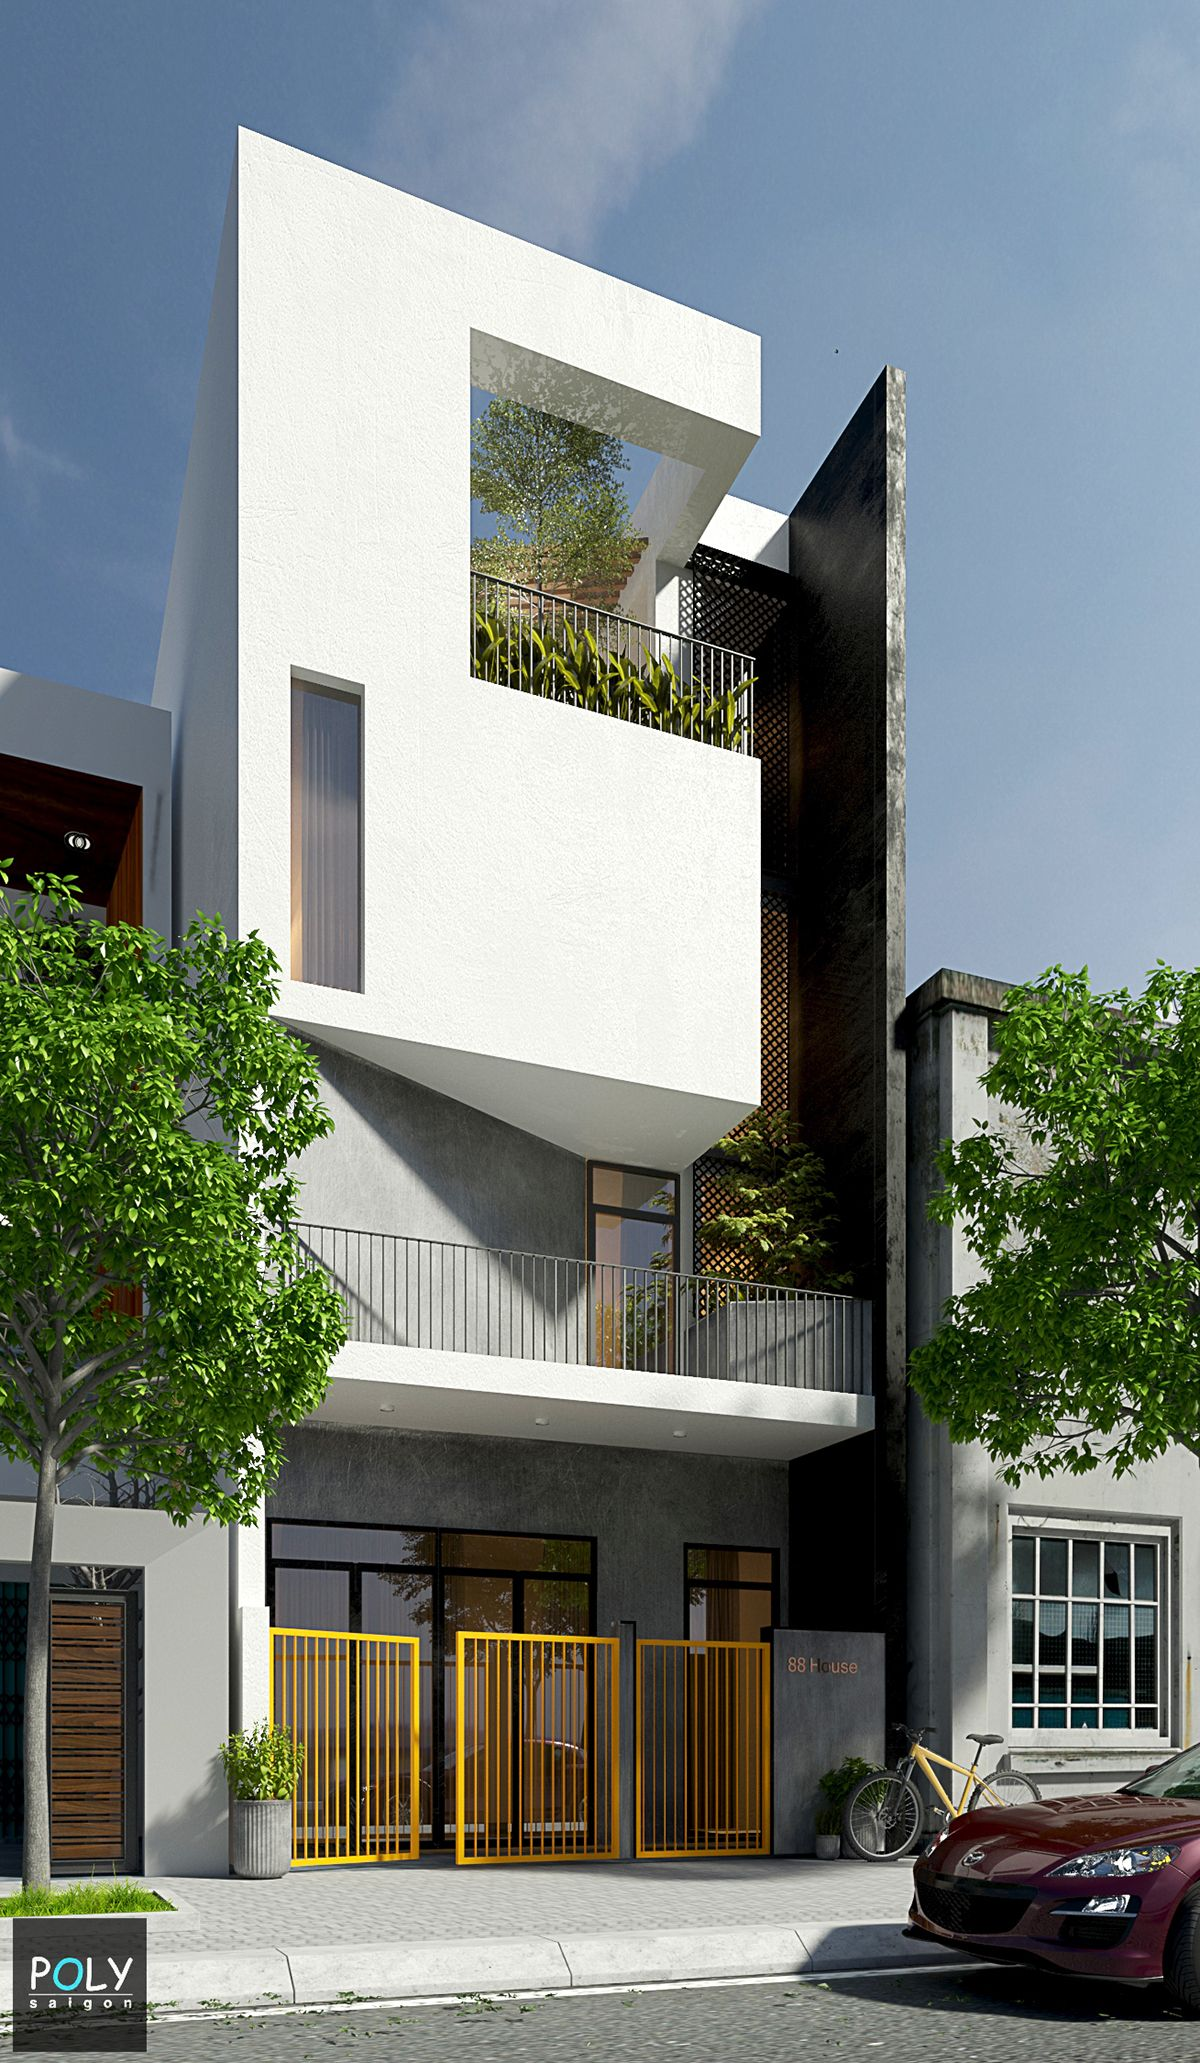 Pin de carlos corchado castillo en house arquitectura for Arquitectura y diseno de casas modernas